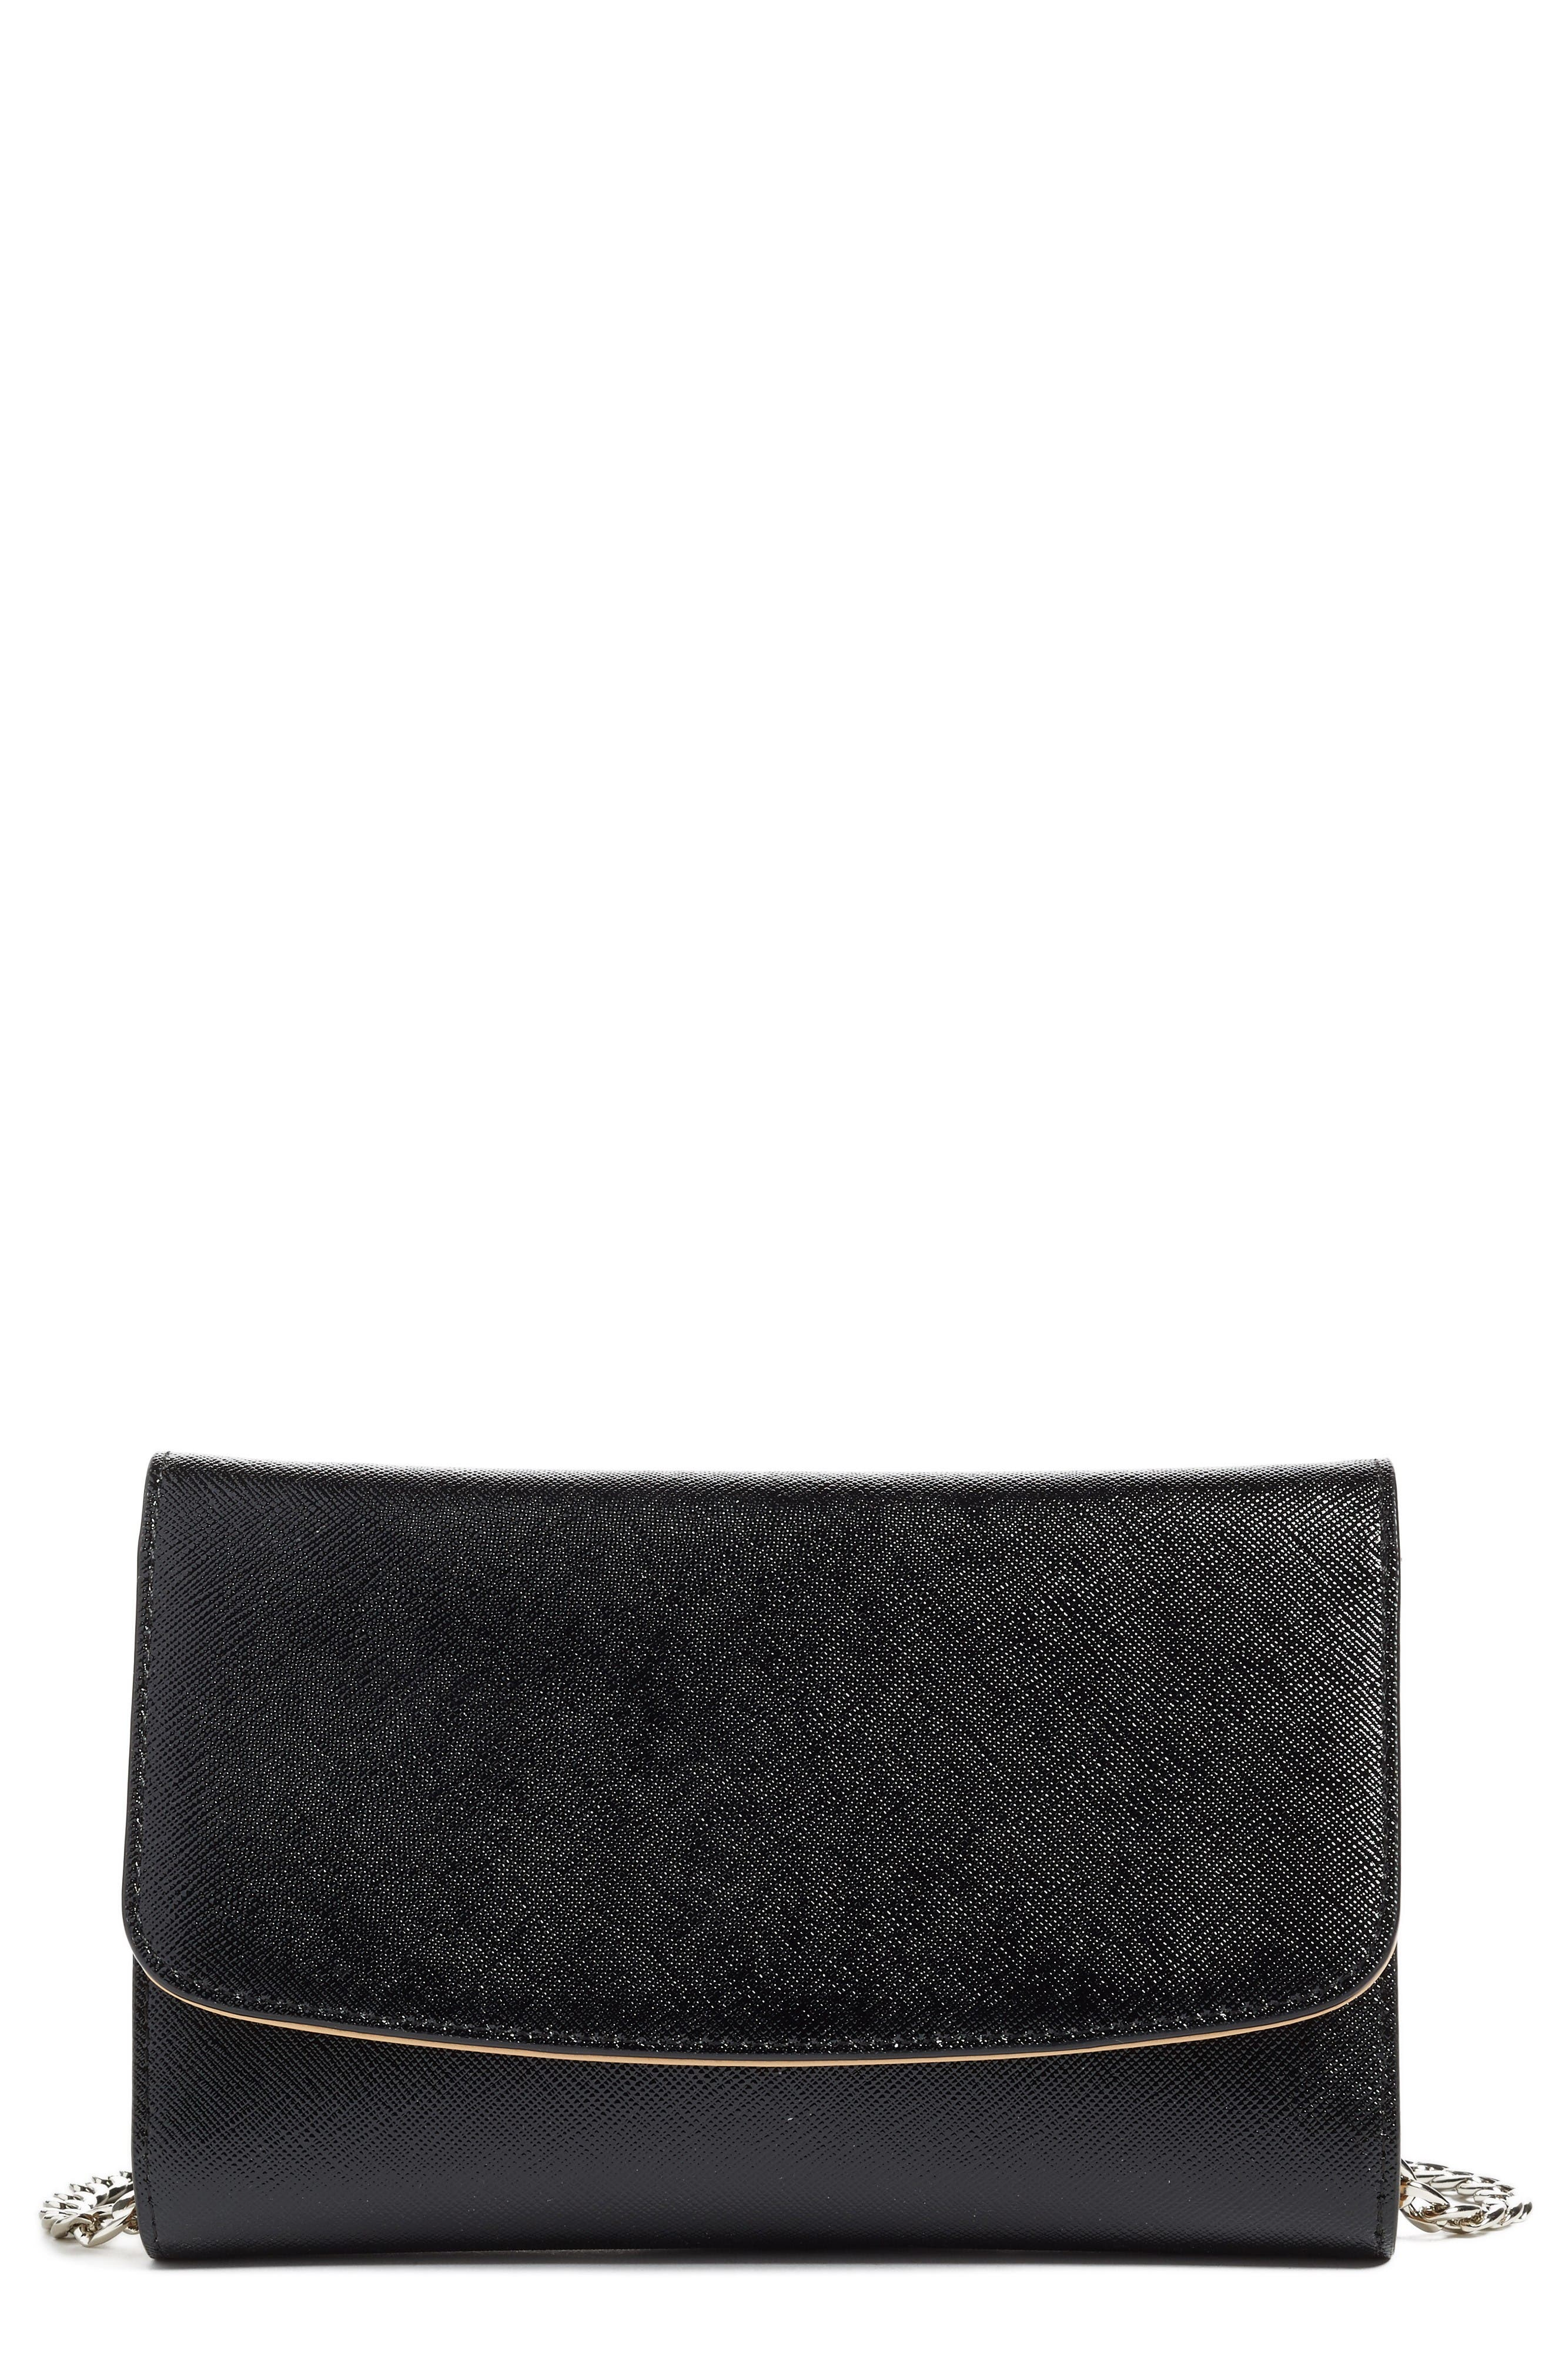 Wallet on a Chain,                         Main,                         color, Black Saffiano